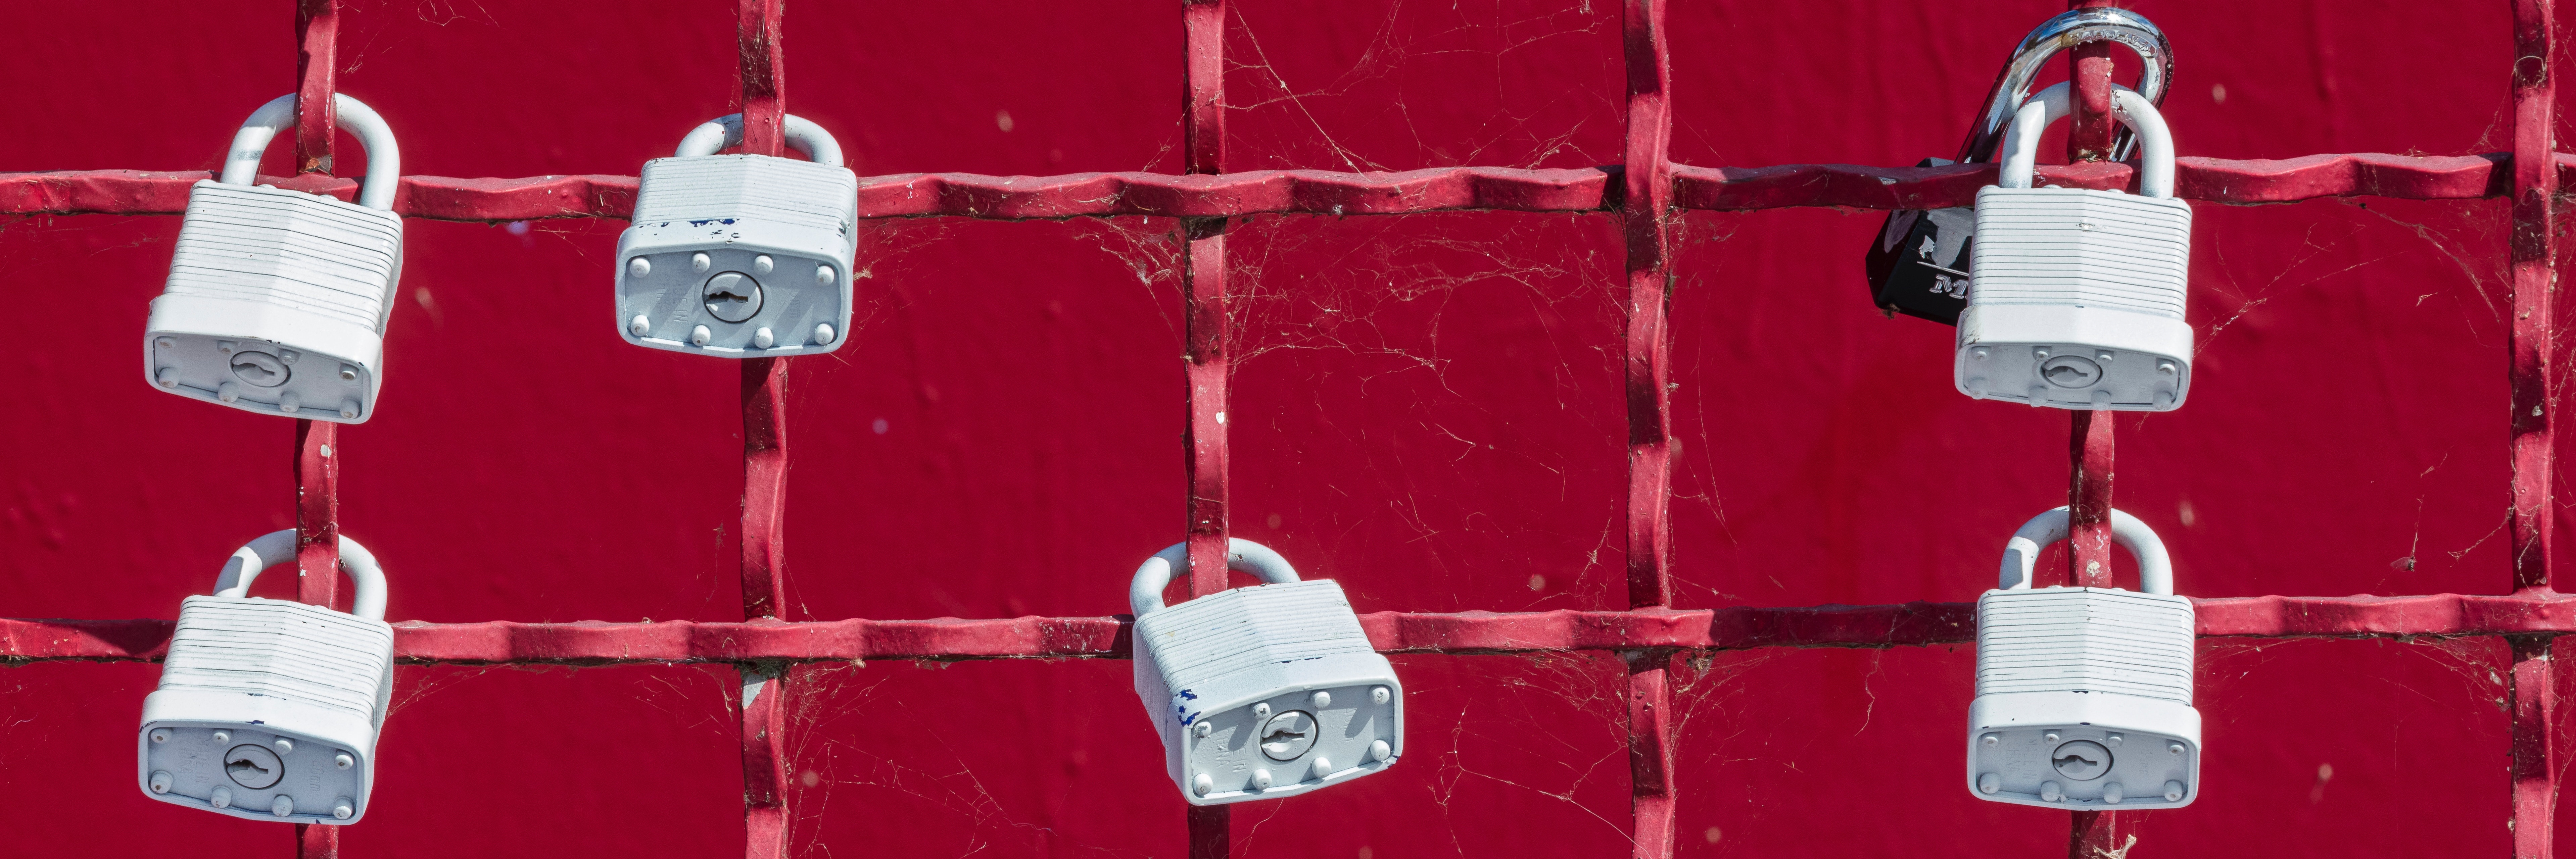 privacy-locks